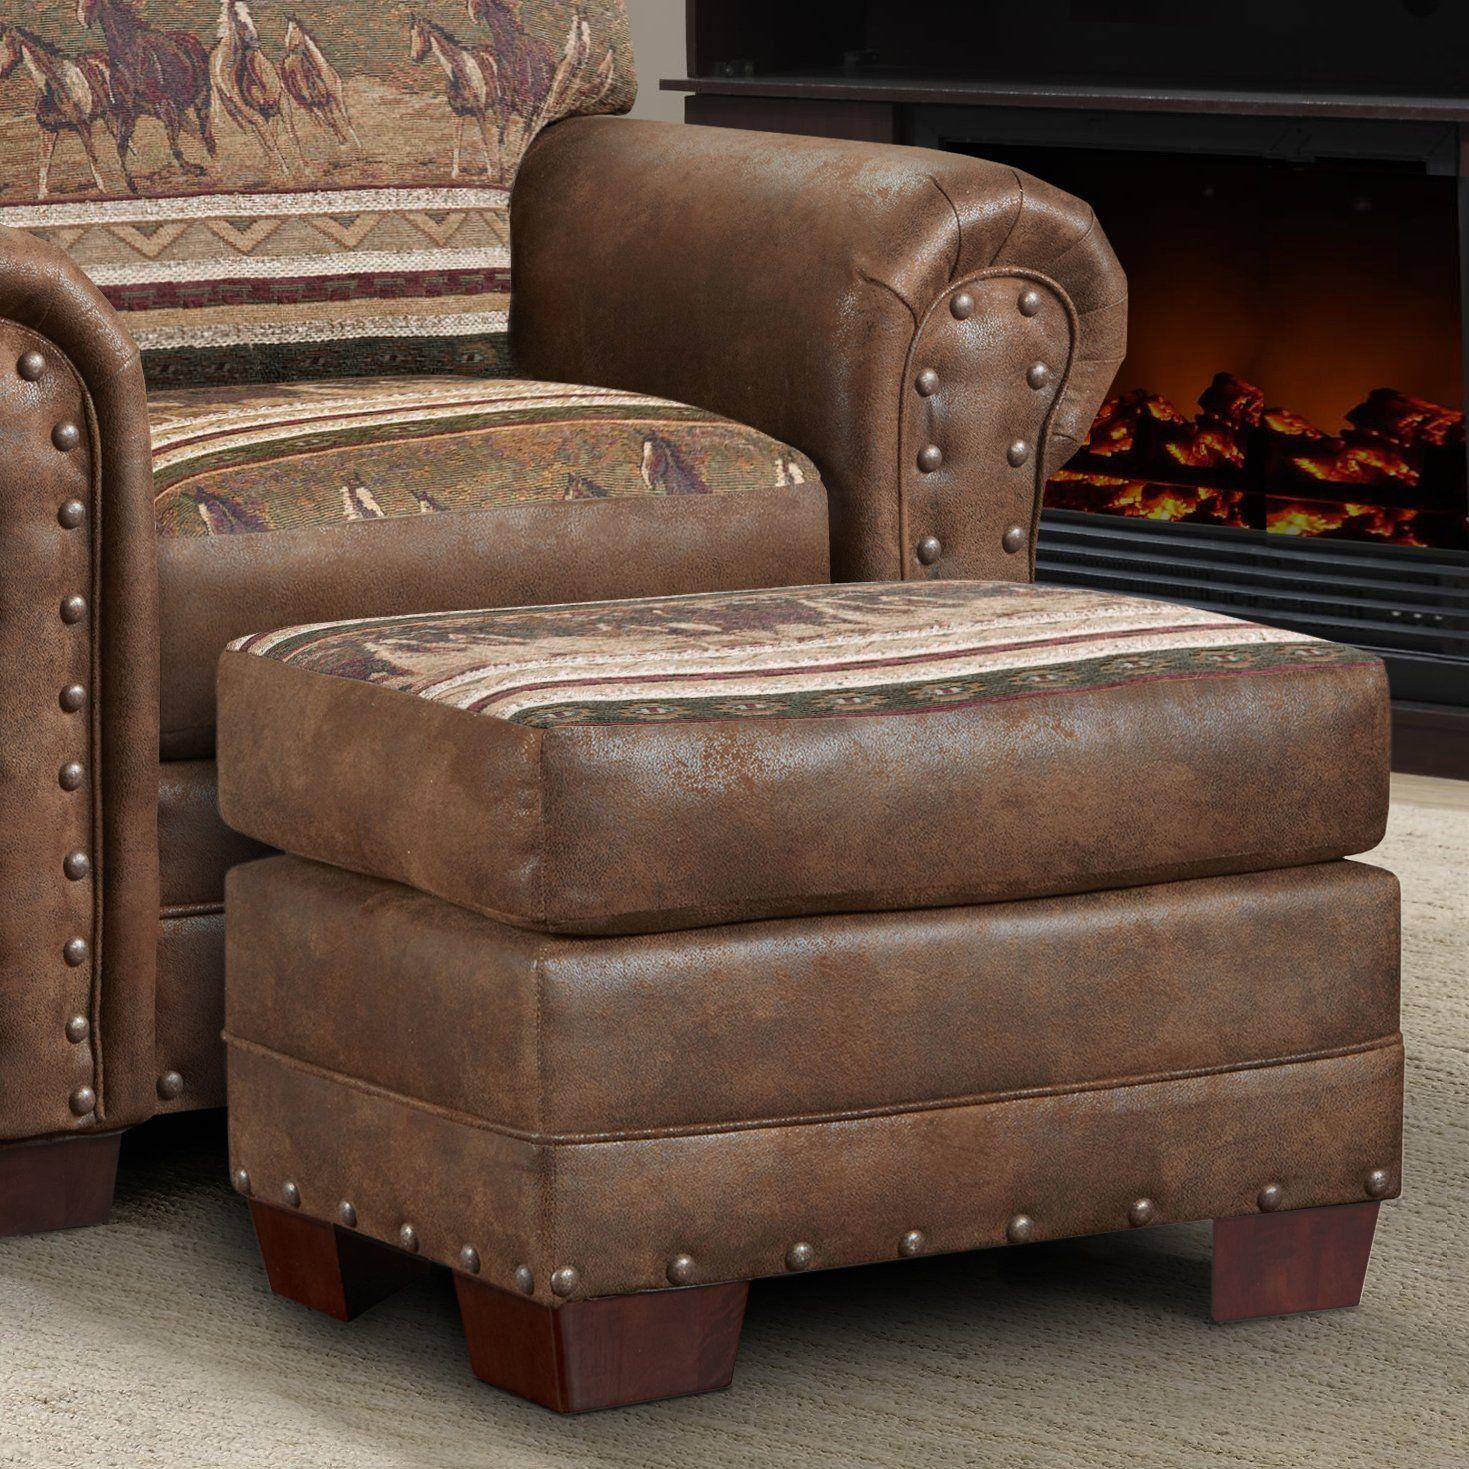 American Furniture Classics Wild Horses Ottoman (With